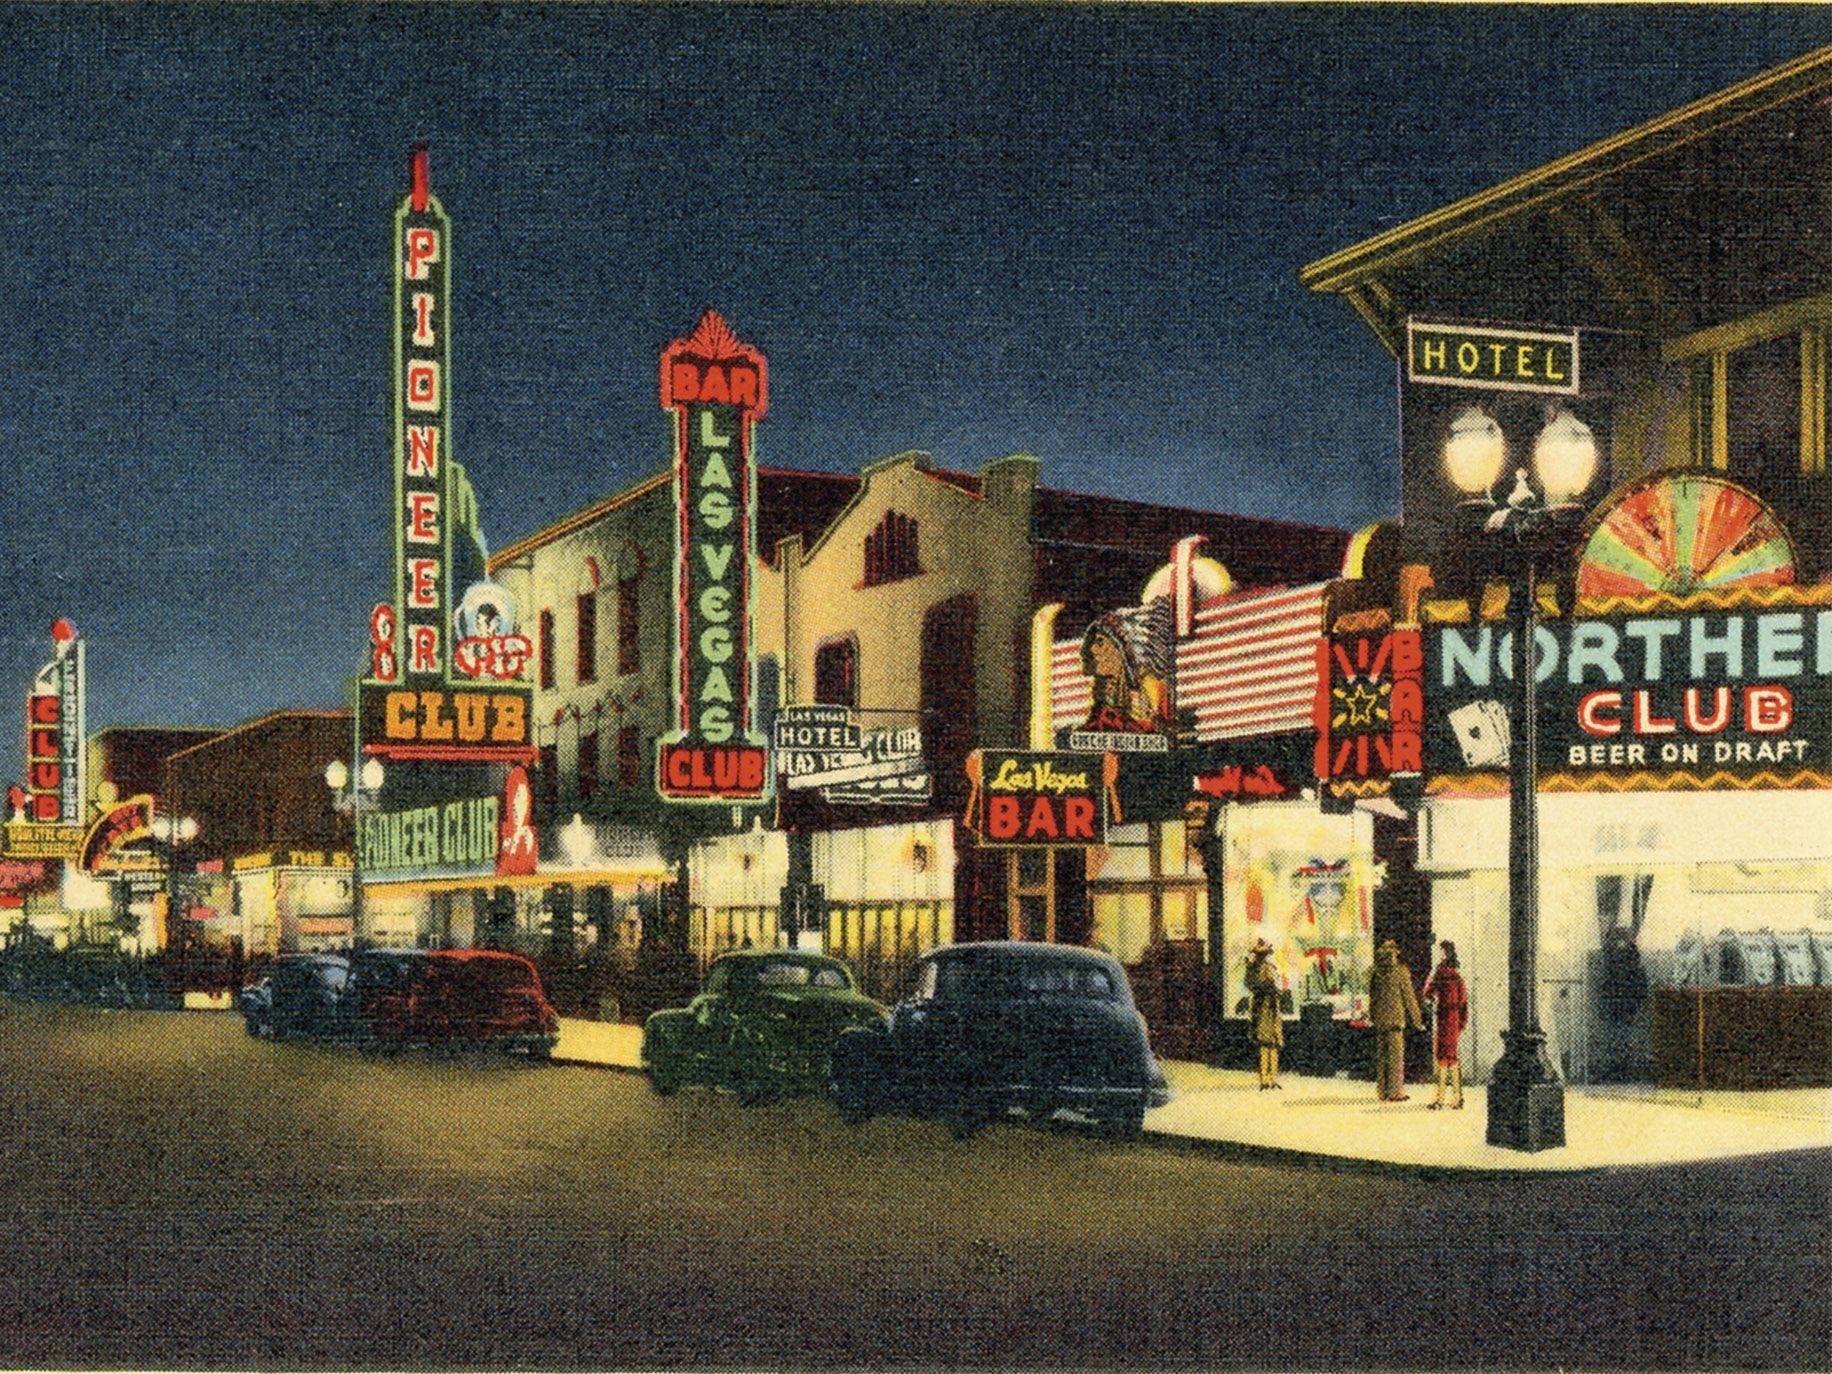 A 1943 scene showing Fremont Street in Las Vegas, from Greetings from Las Vegas.